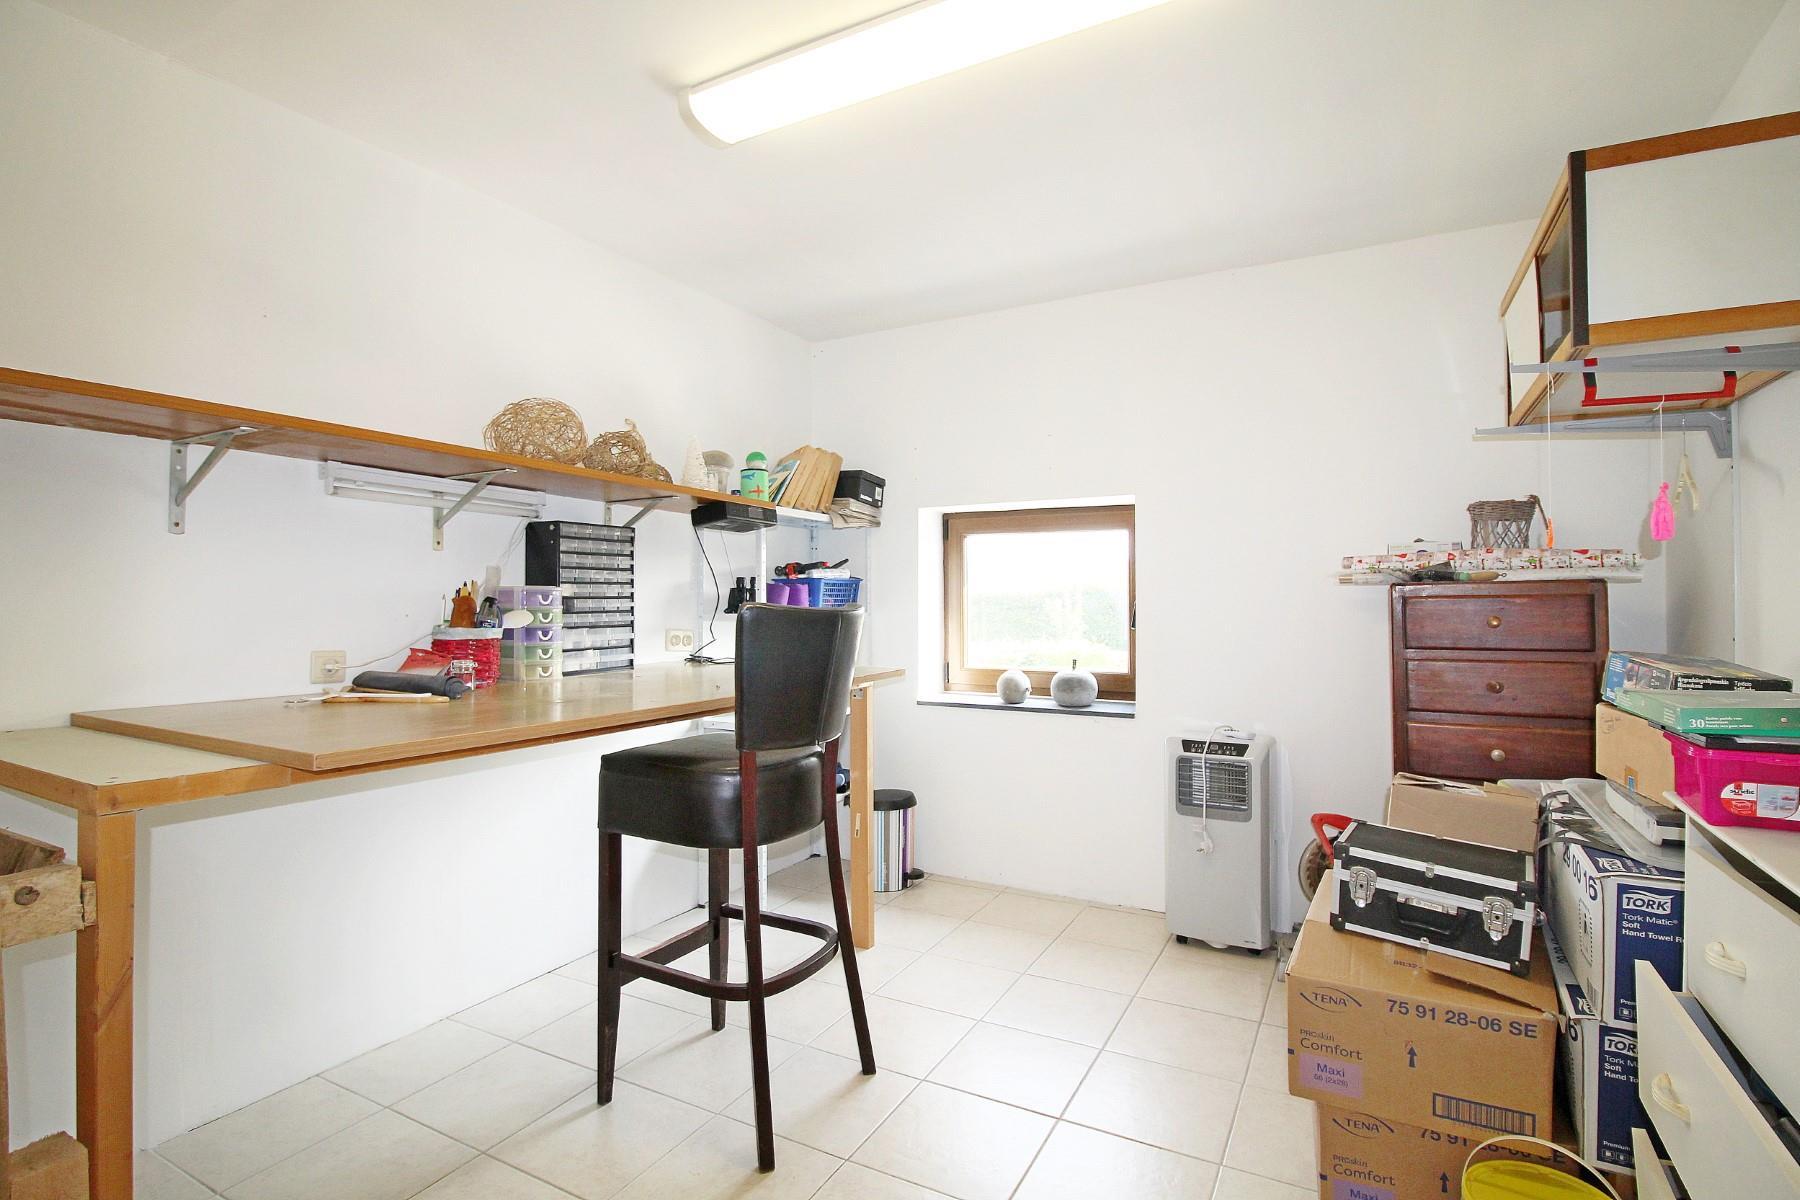 Maison - Bolinne - #4164476-14